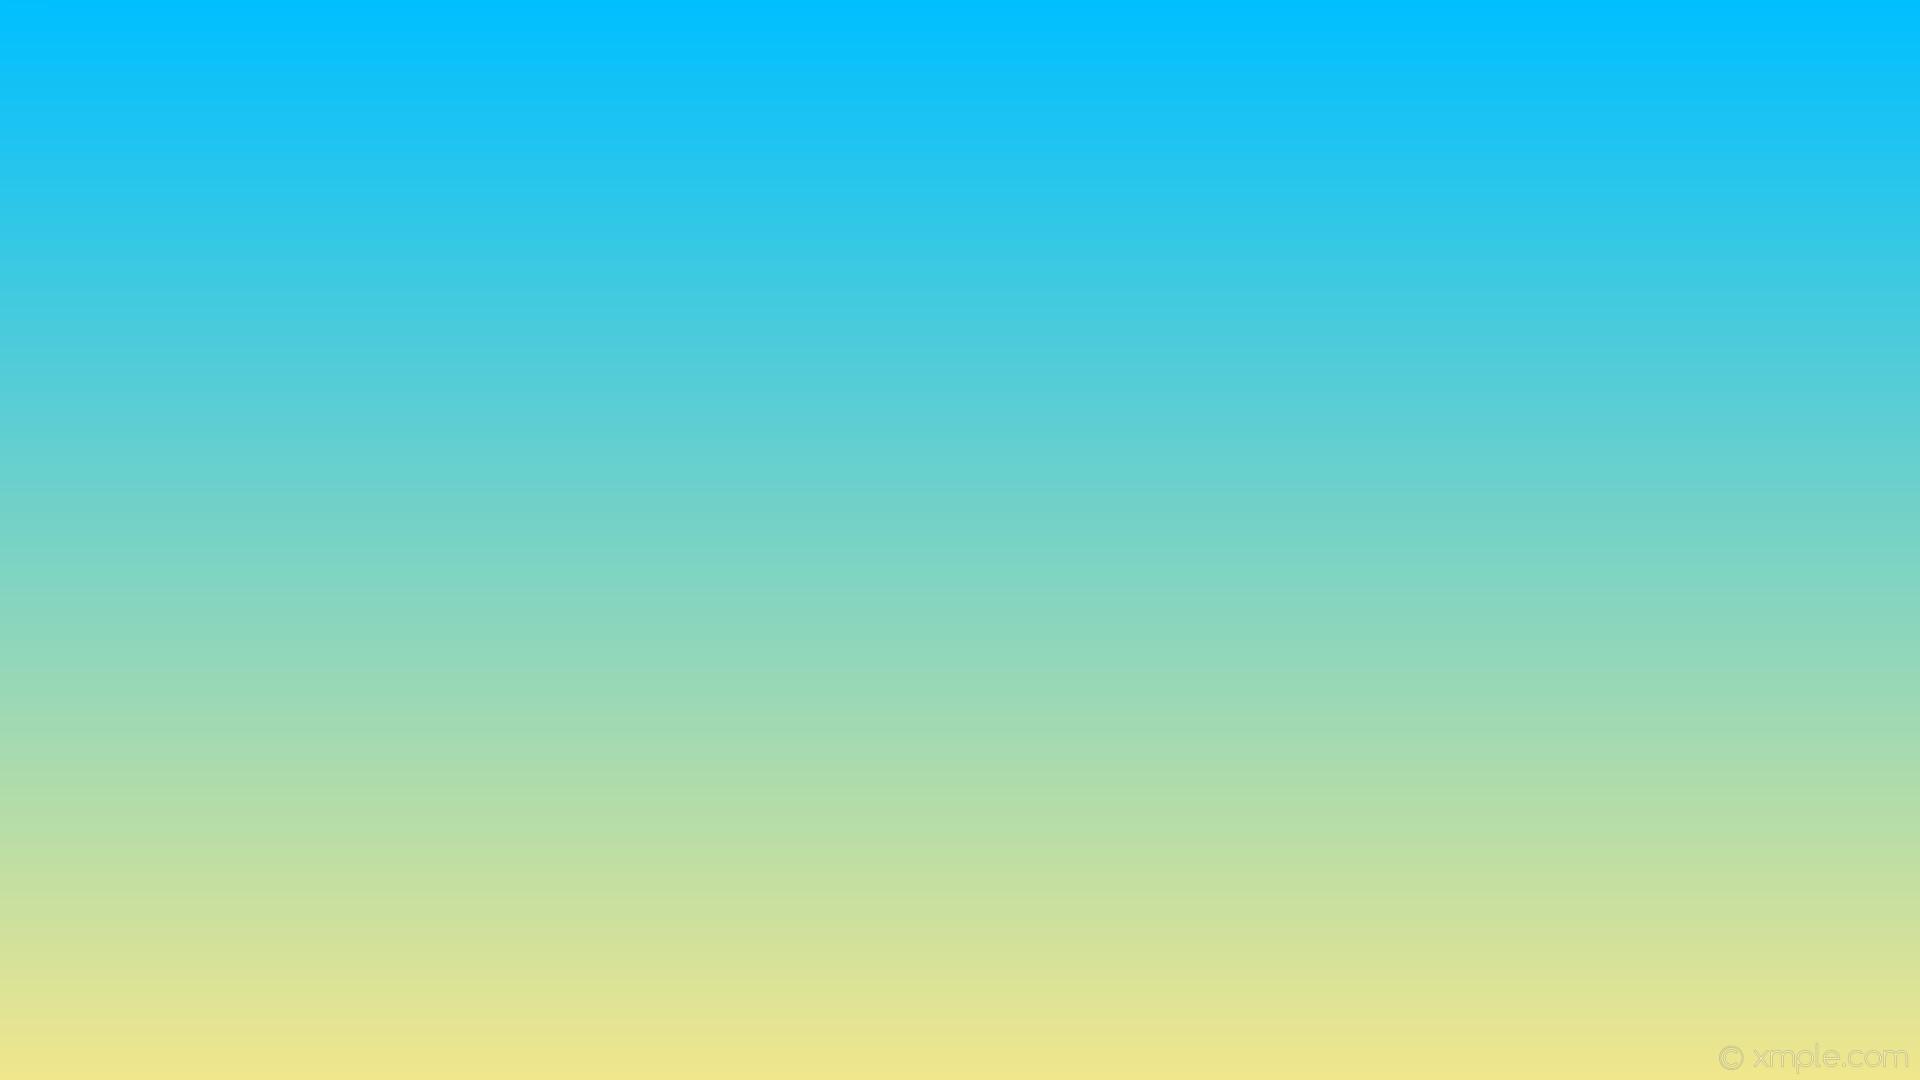 wallpaper linear blue yellow gradient khaki deep sky blue #f0e68c #00bfff  270°